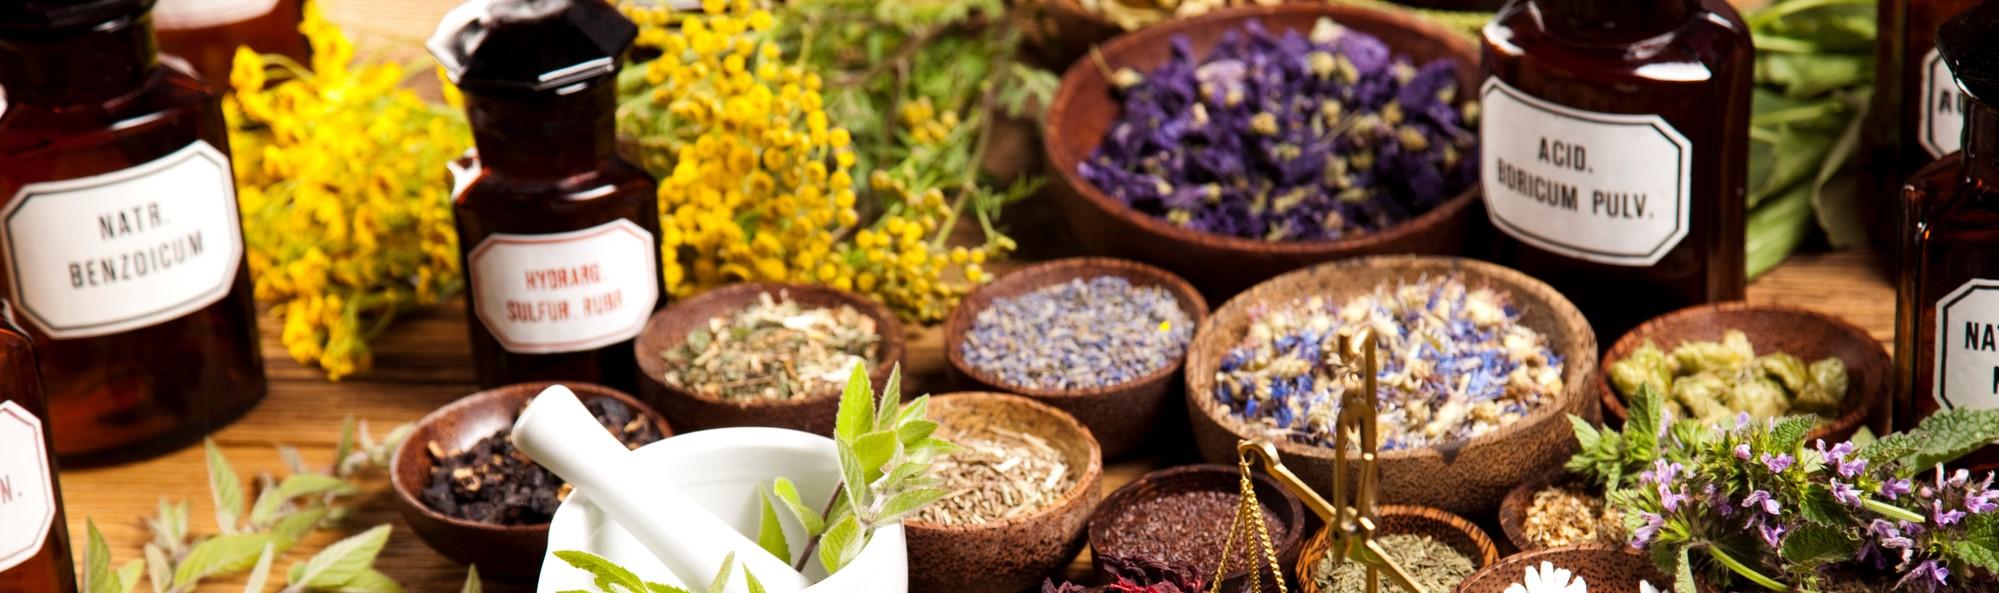 Naturopathic Doctor | Herbalist | Holistc Health | New York City